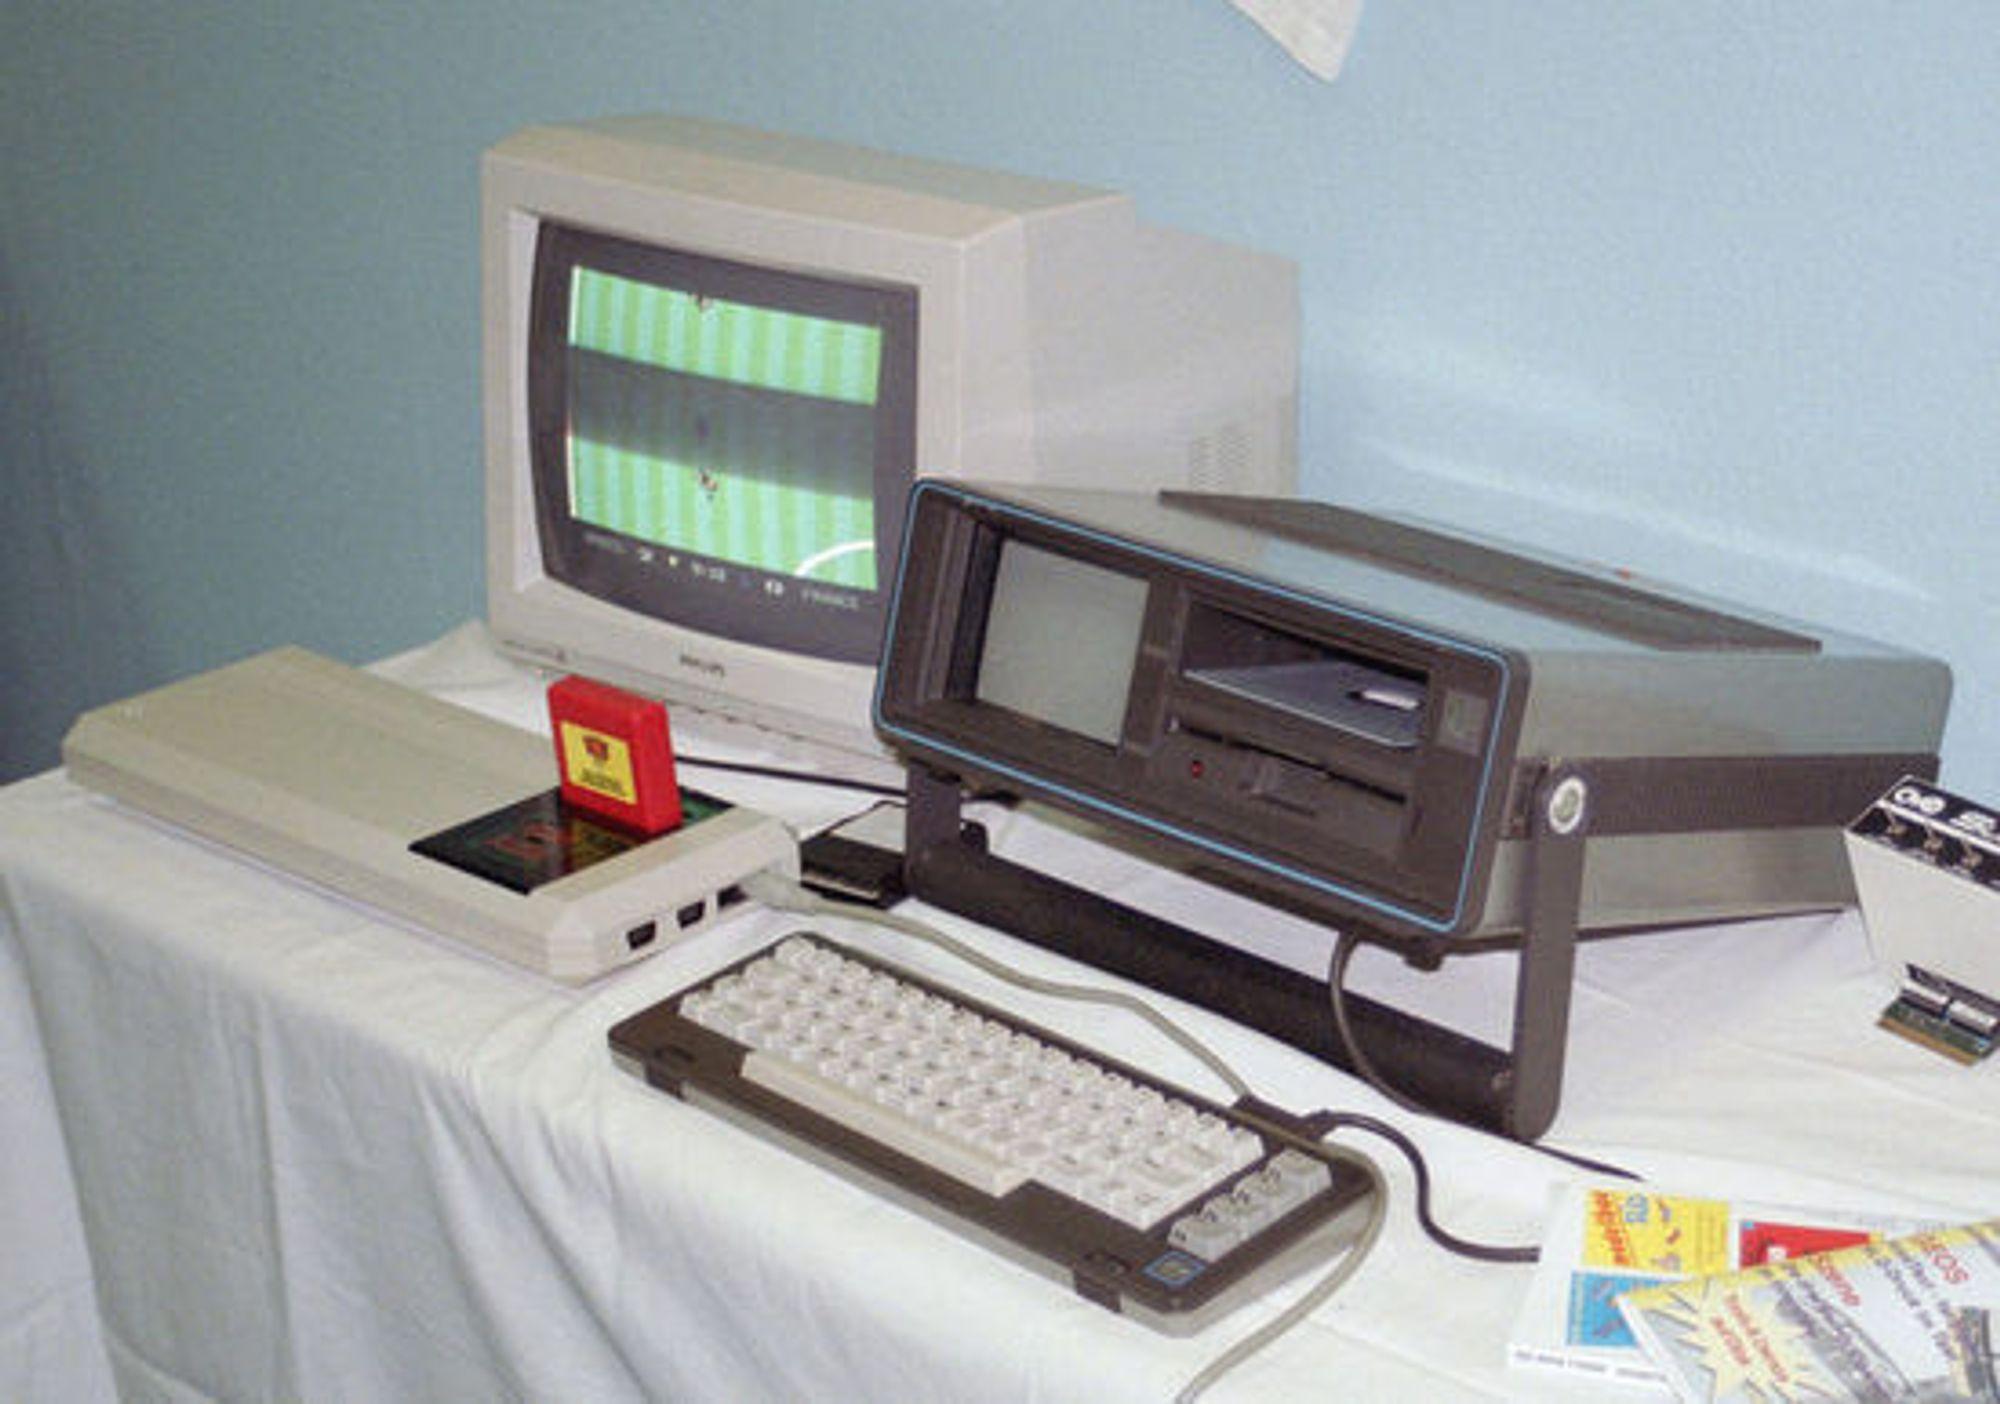 Spillkonsollen Commodore C64GS og den bærbare SX-64.